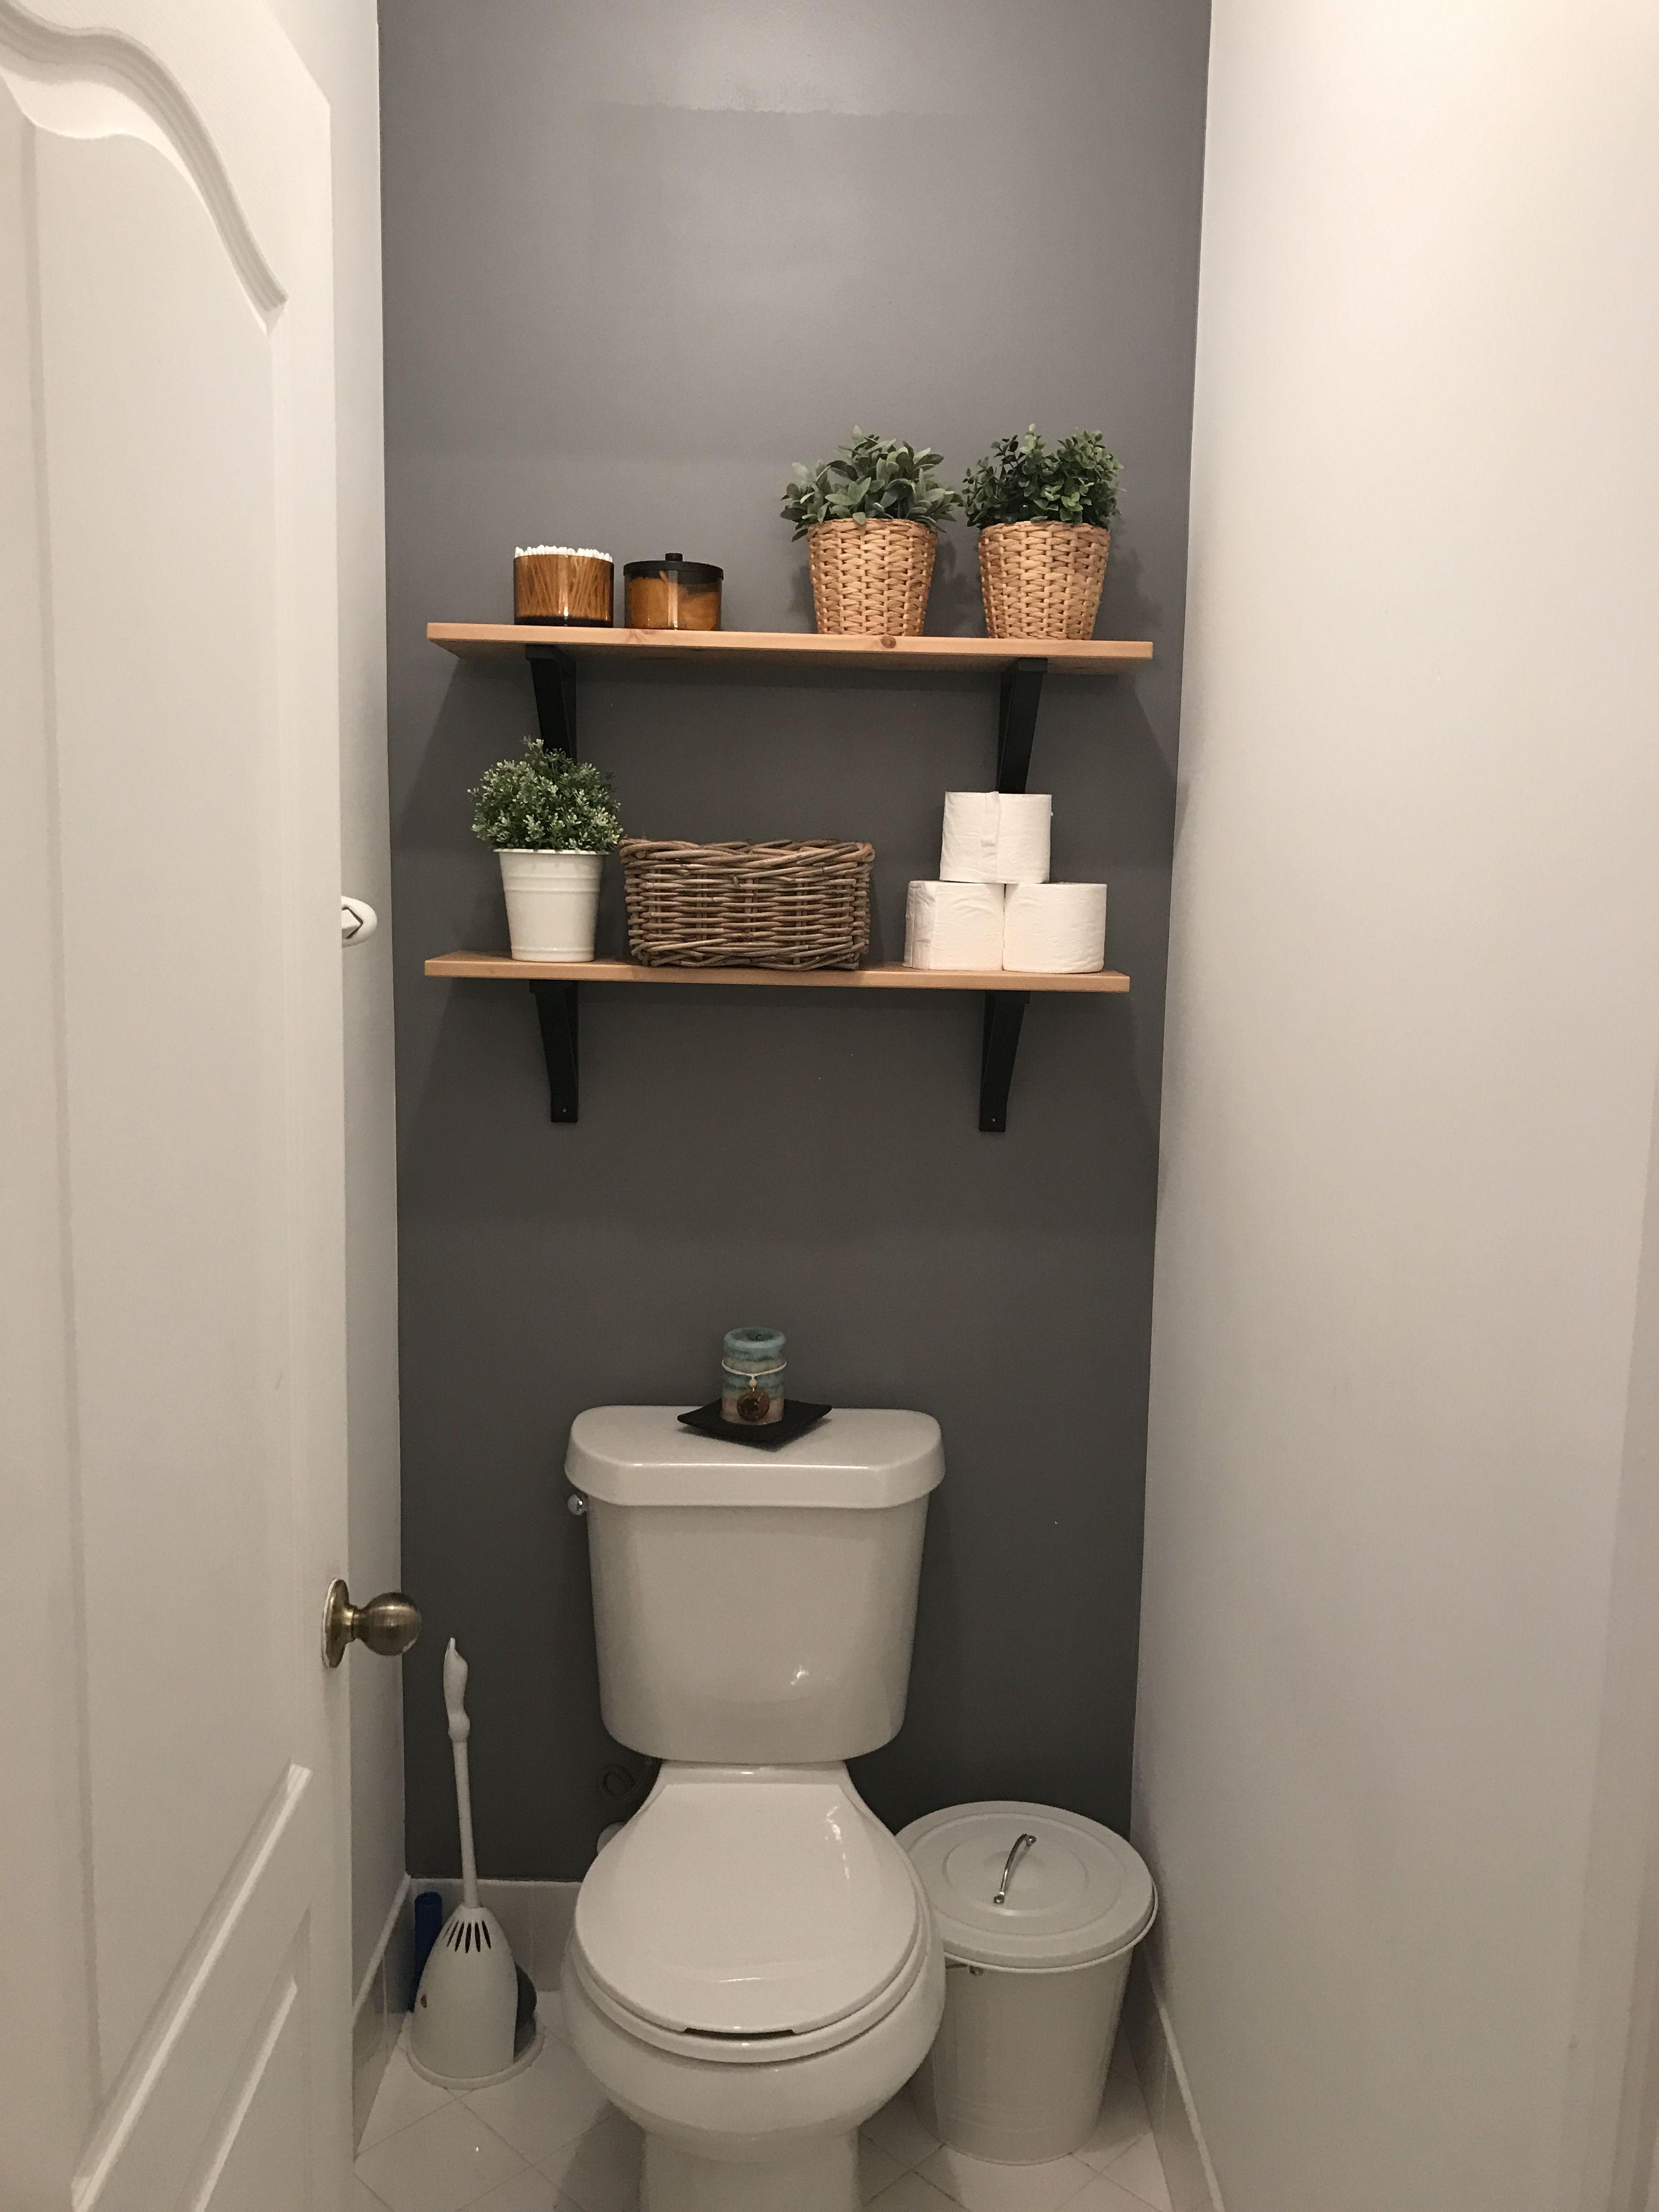 How Easy Was This To Do Ikea Smallbathroom Greywall Deco Toilettes Decoration Toilettes Idee Deco Toilettes